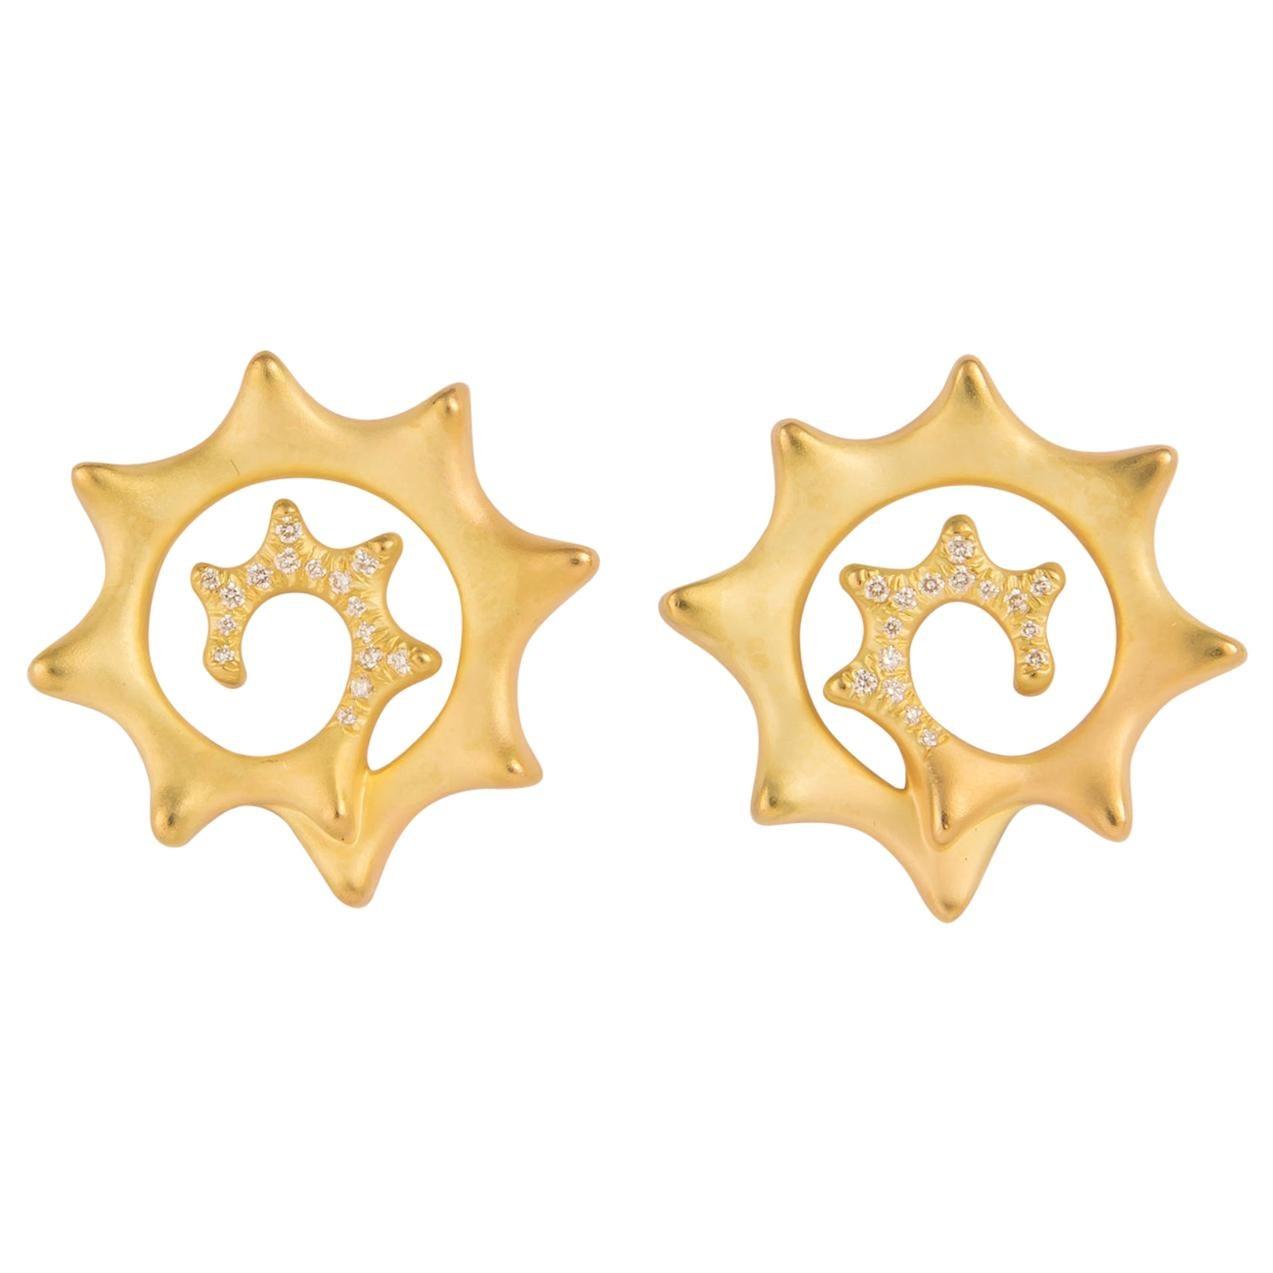 Angela Cummings Gold and Diamond Earrings